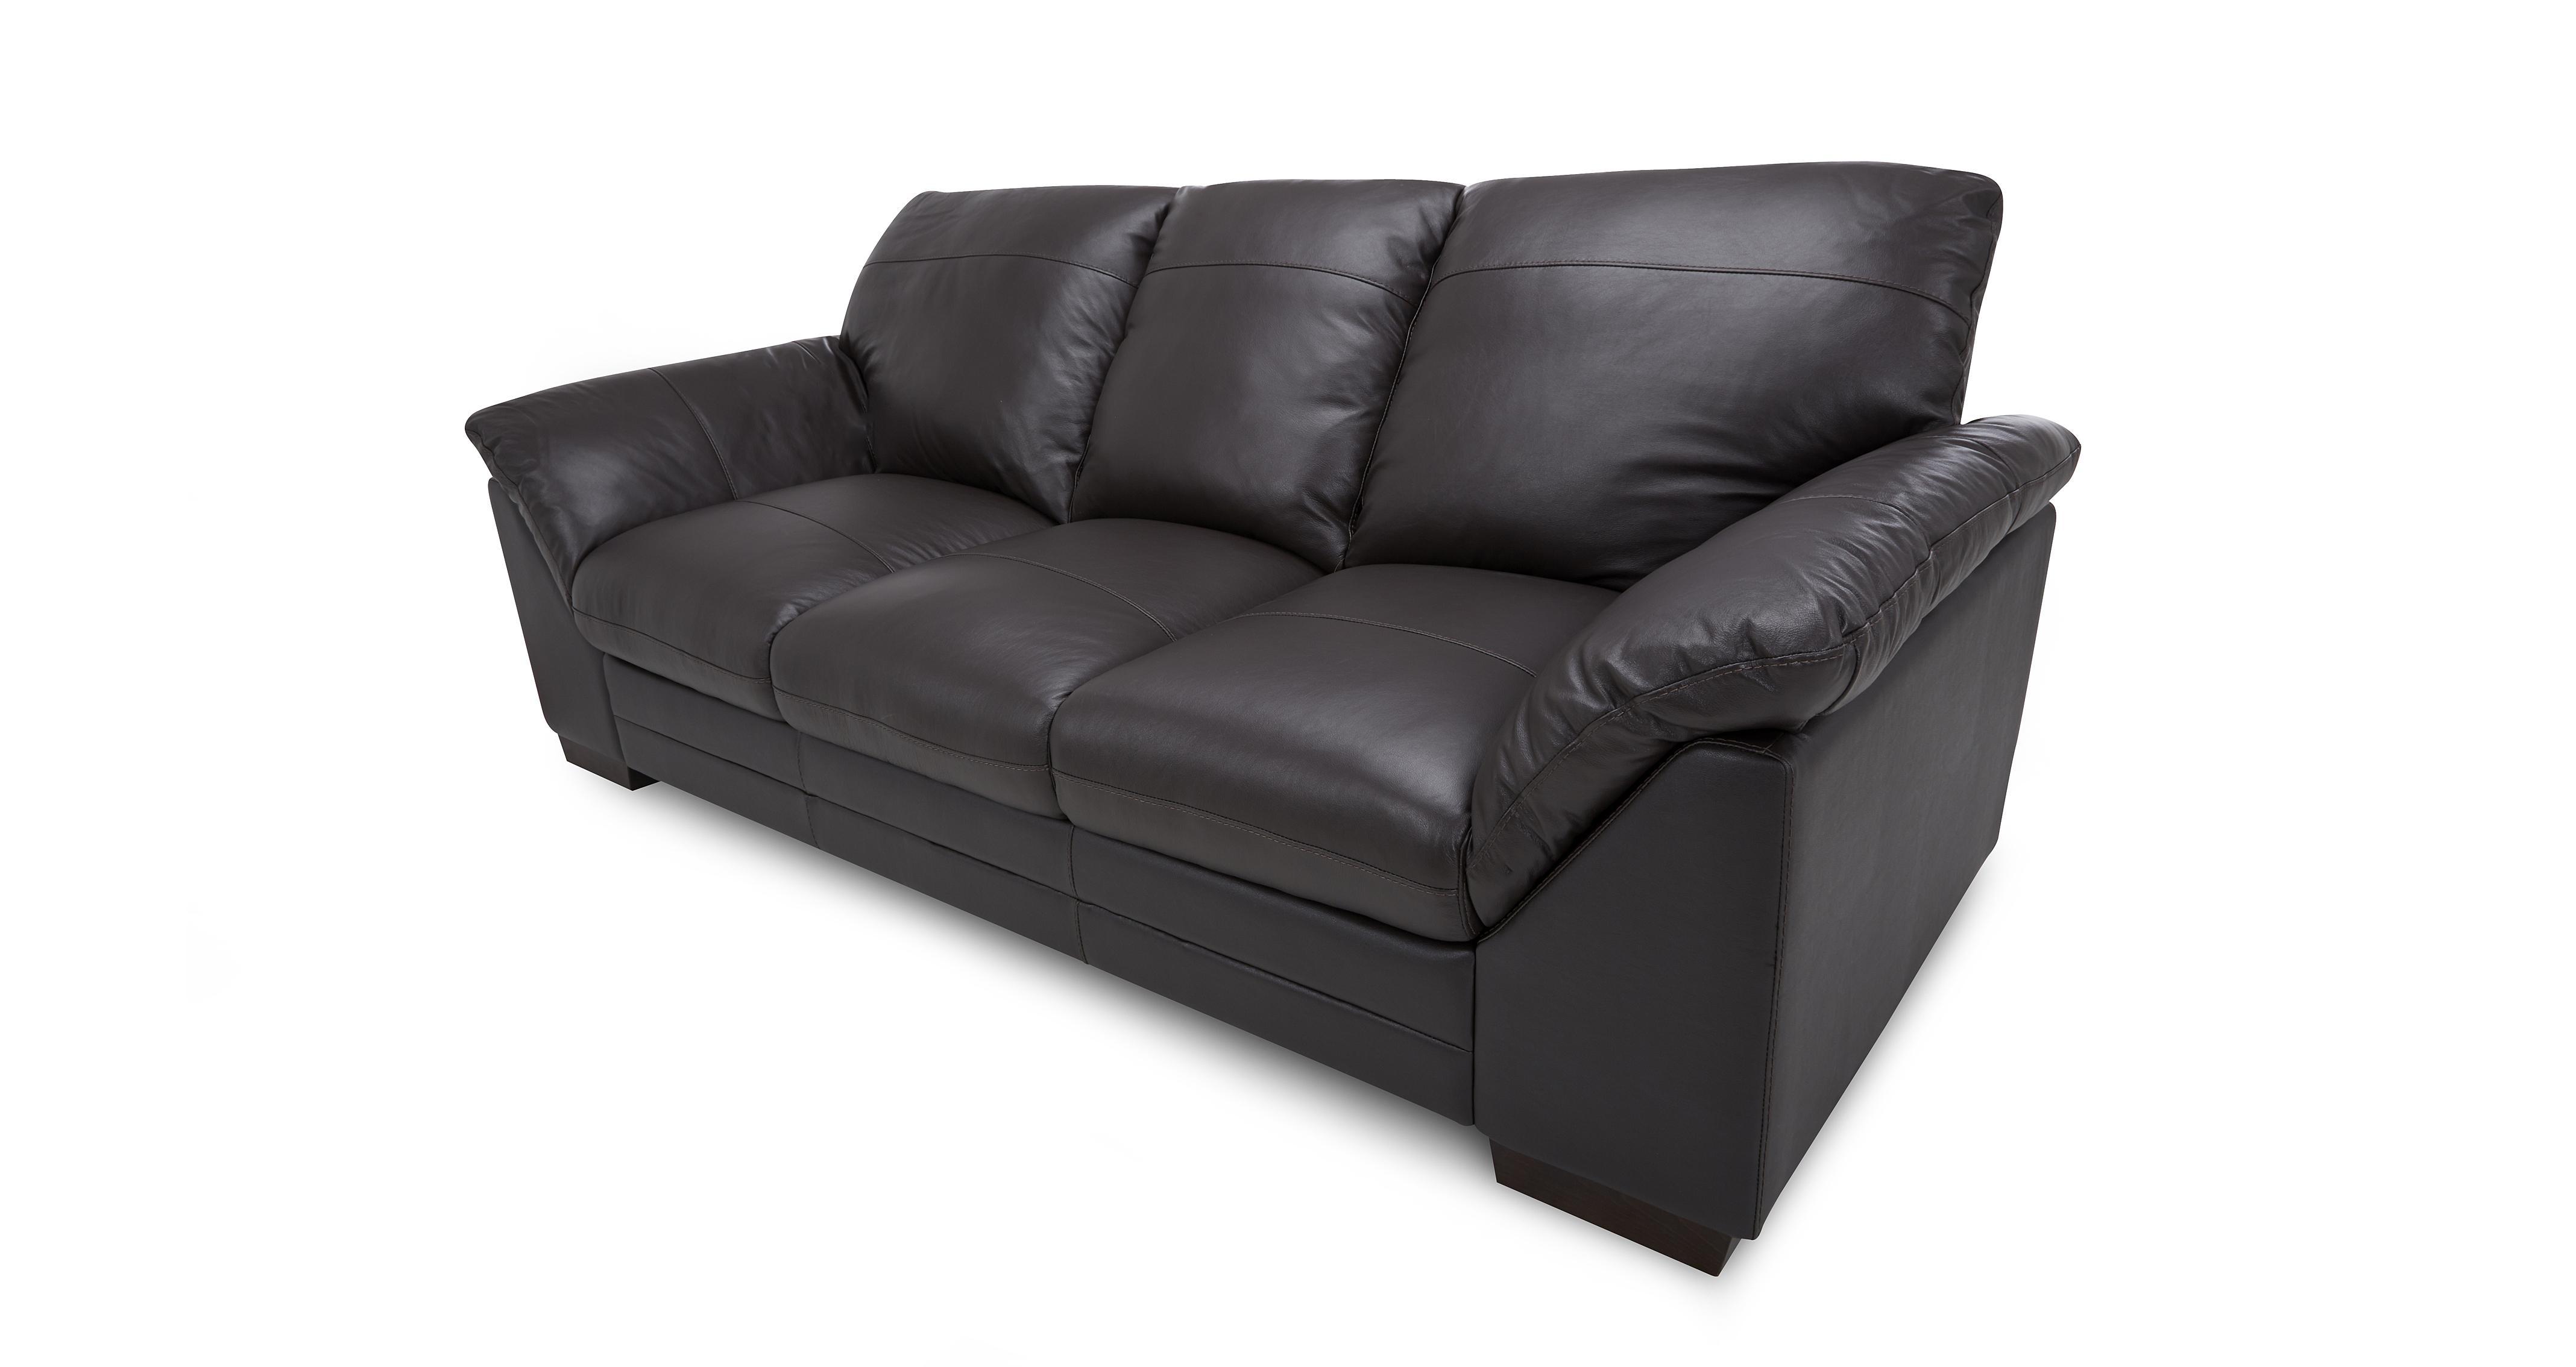 leather sofa brown dfs macy s cognac palmo mocha set inc 3 seater 2